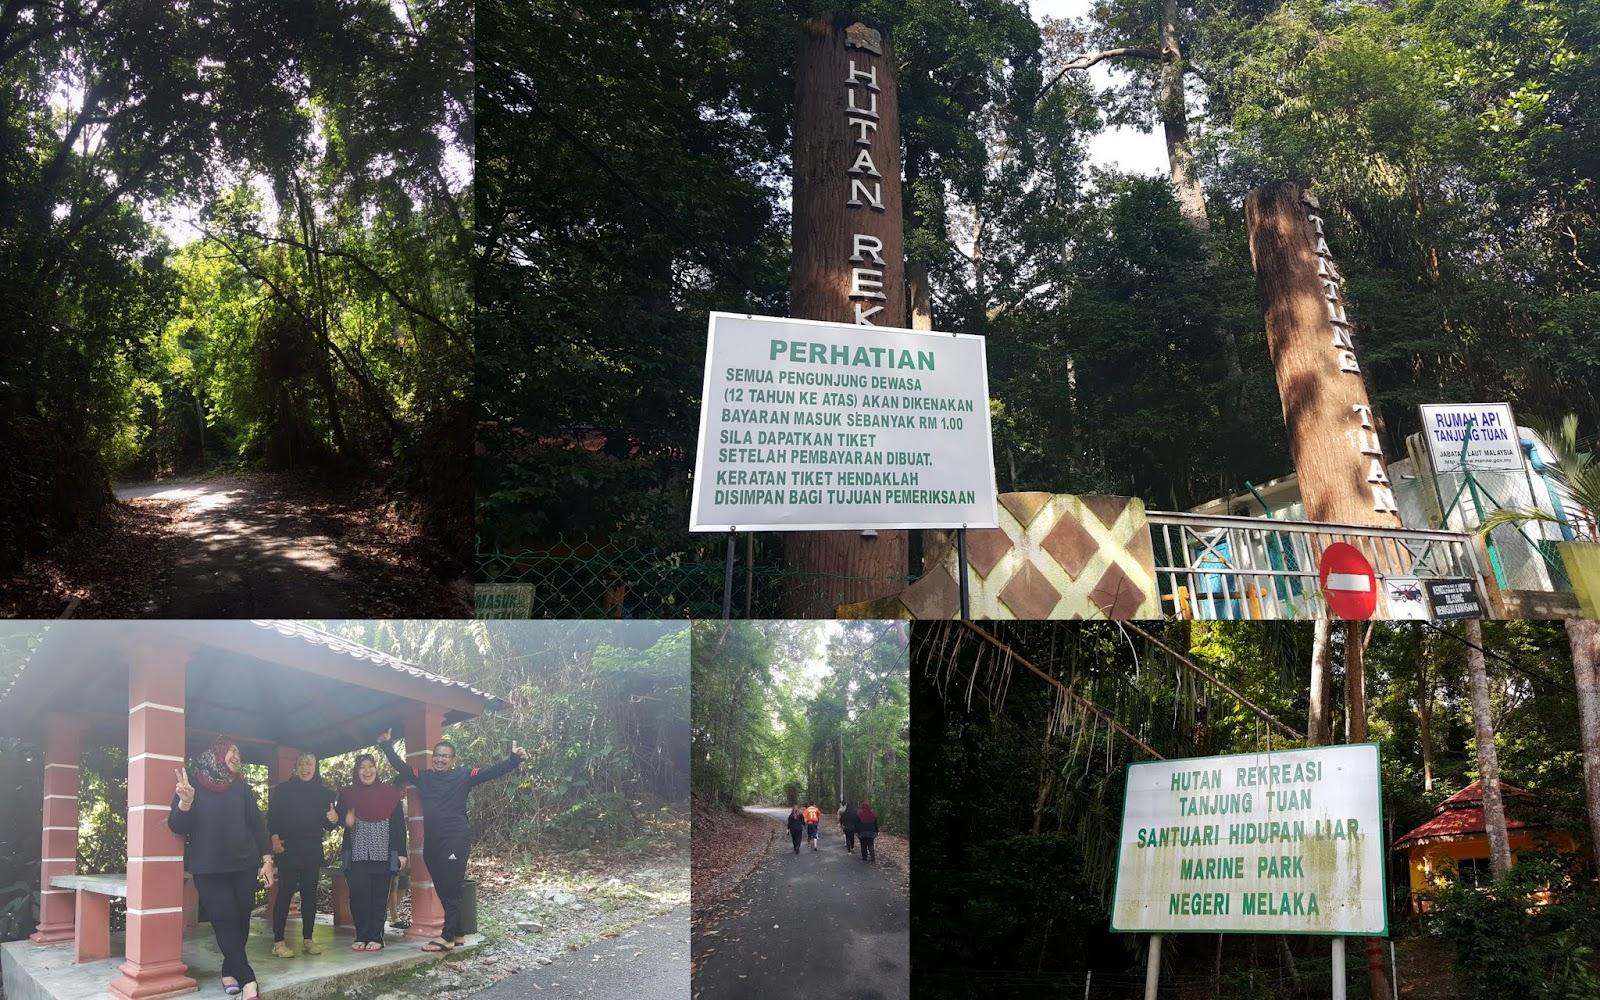 Hutan Rekreasi Tanjung Tuan, Melaka